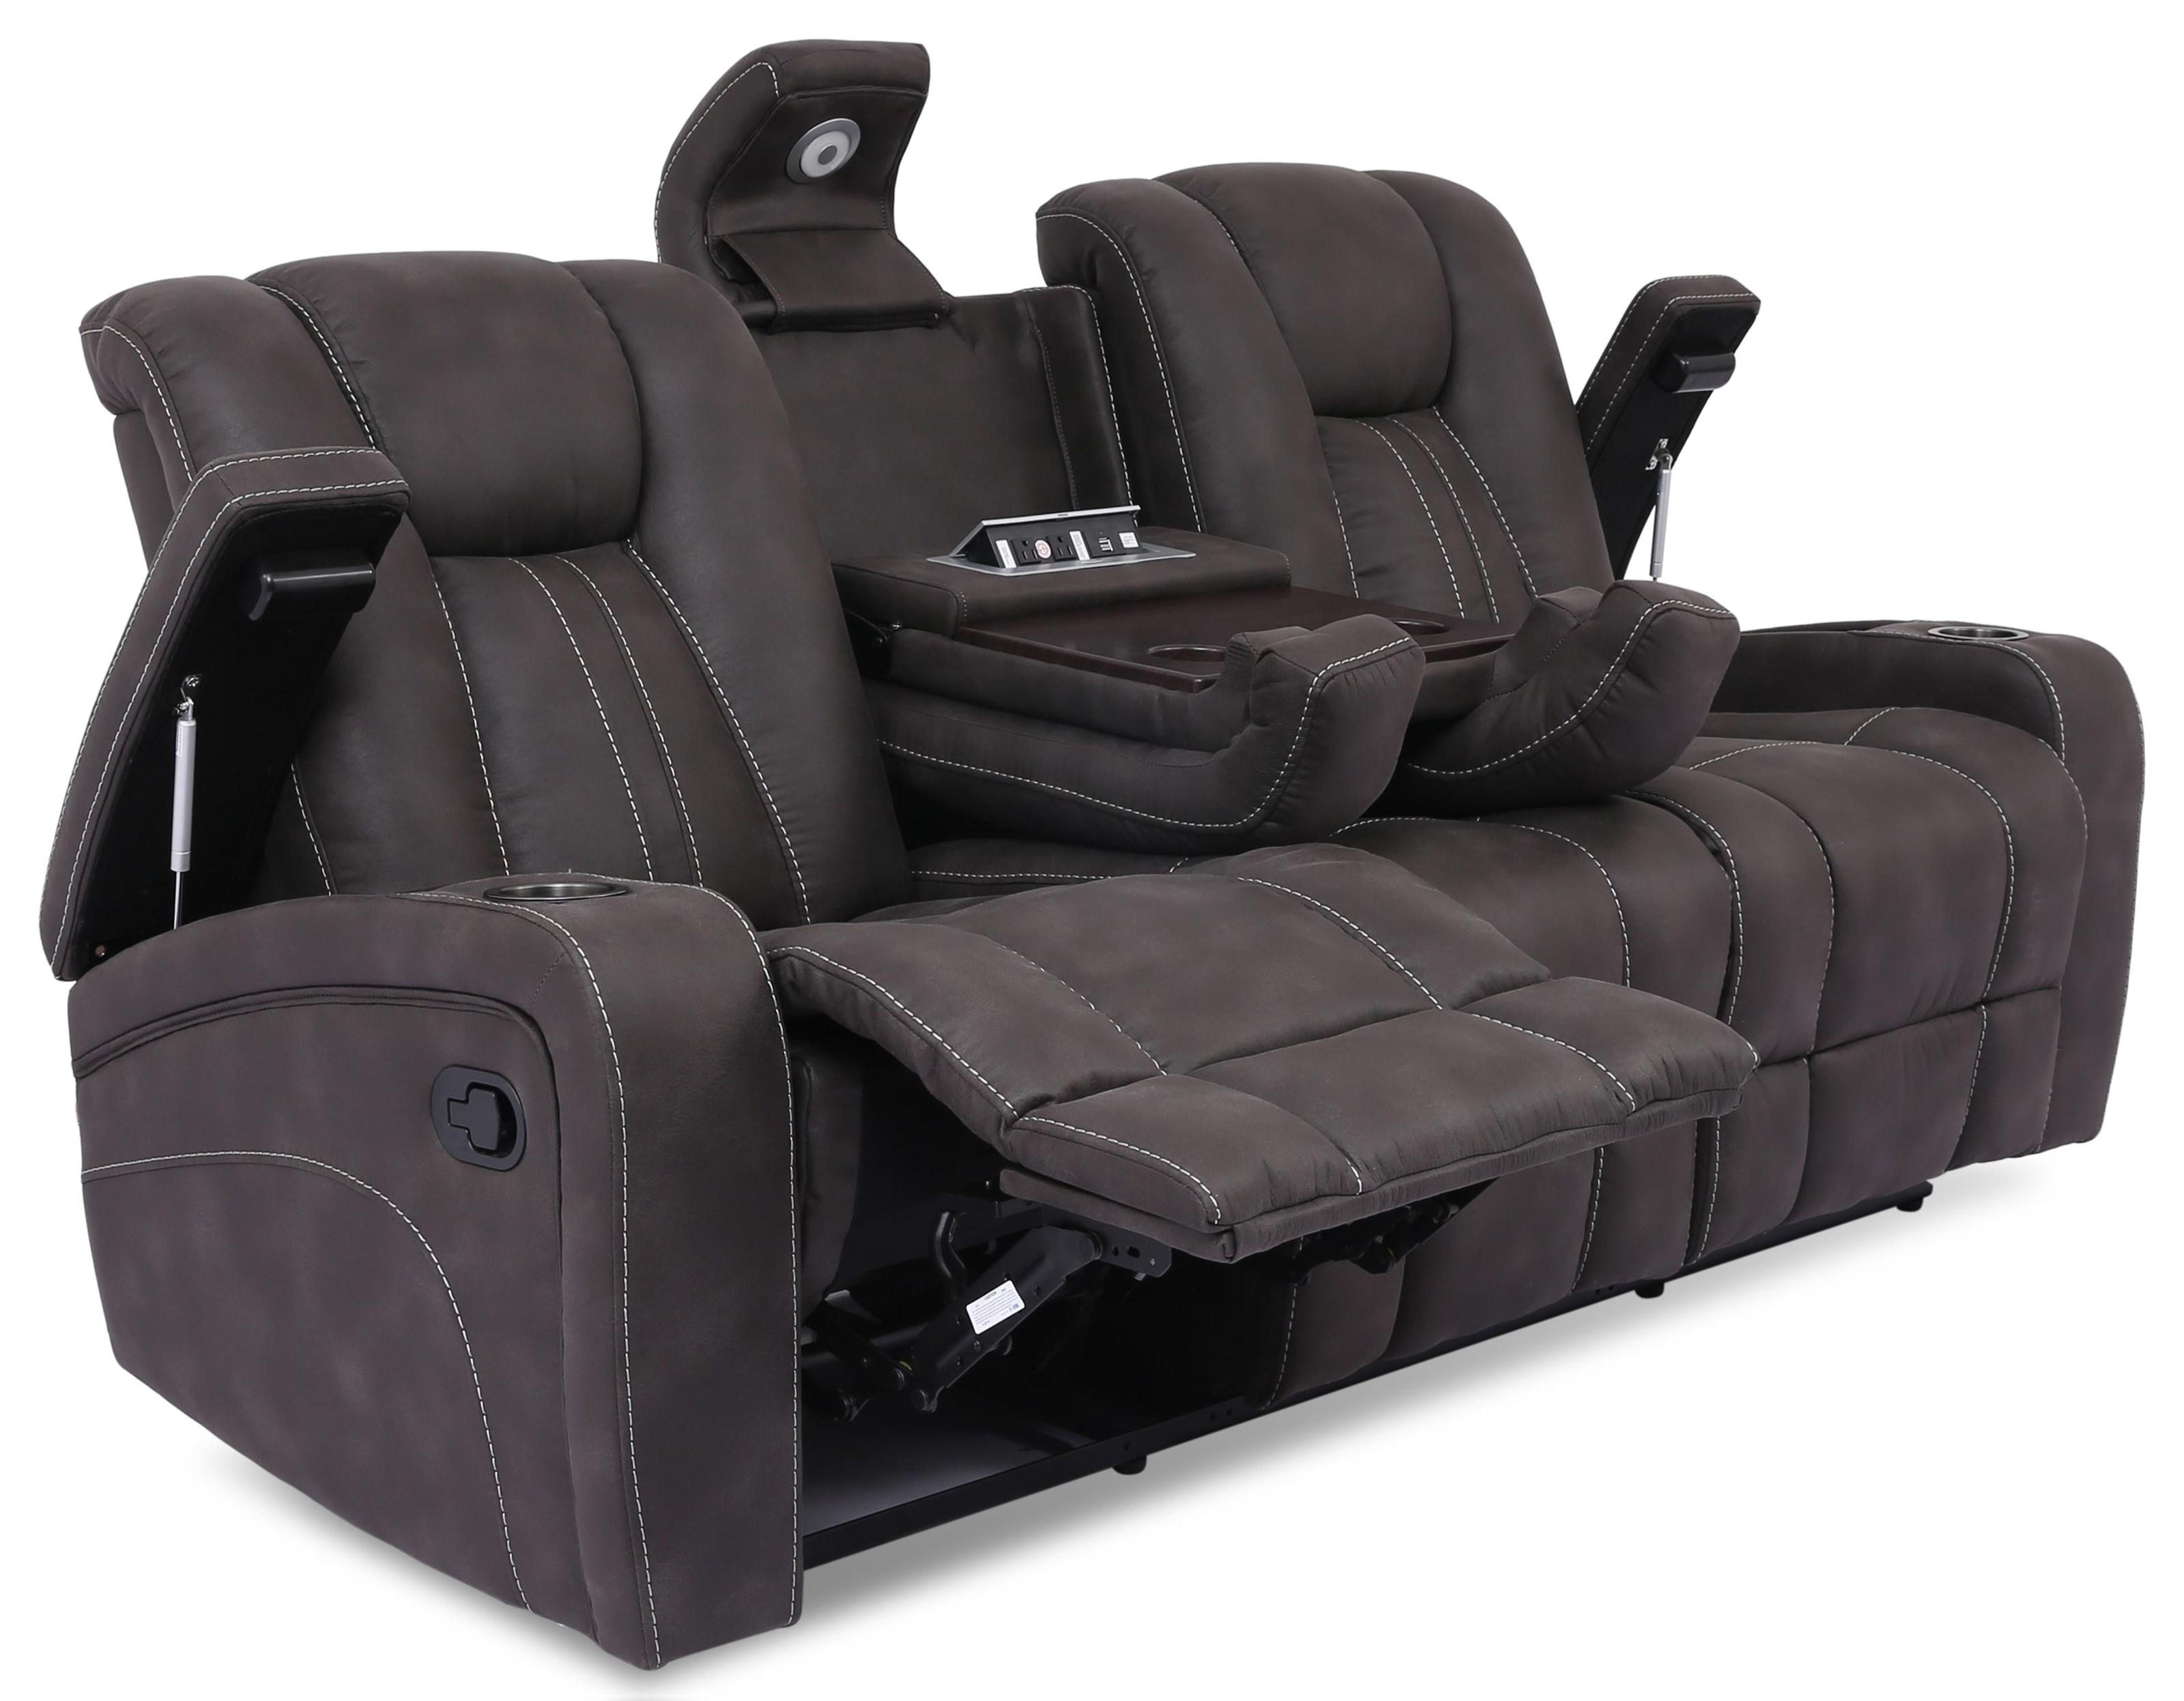 9990M Dual Reclining Sofa by Cheers at Furniture Fair - North Carolina